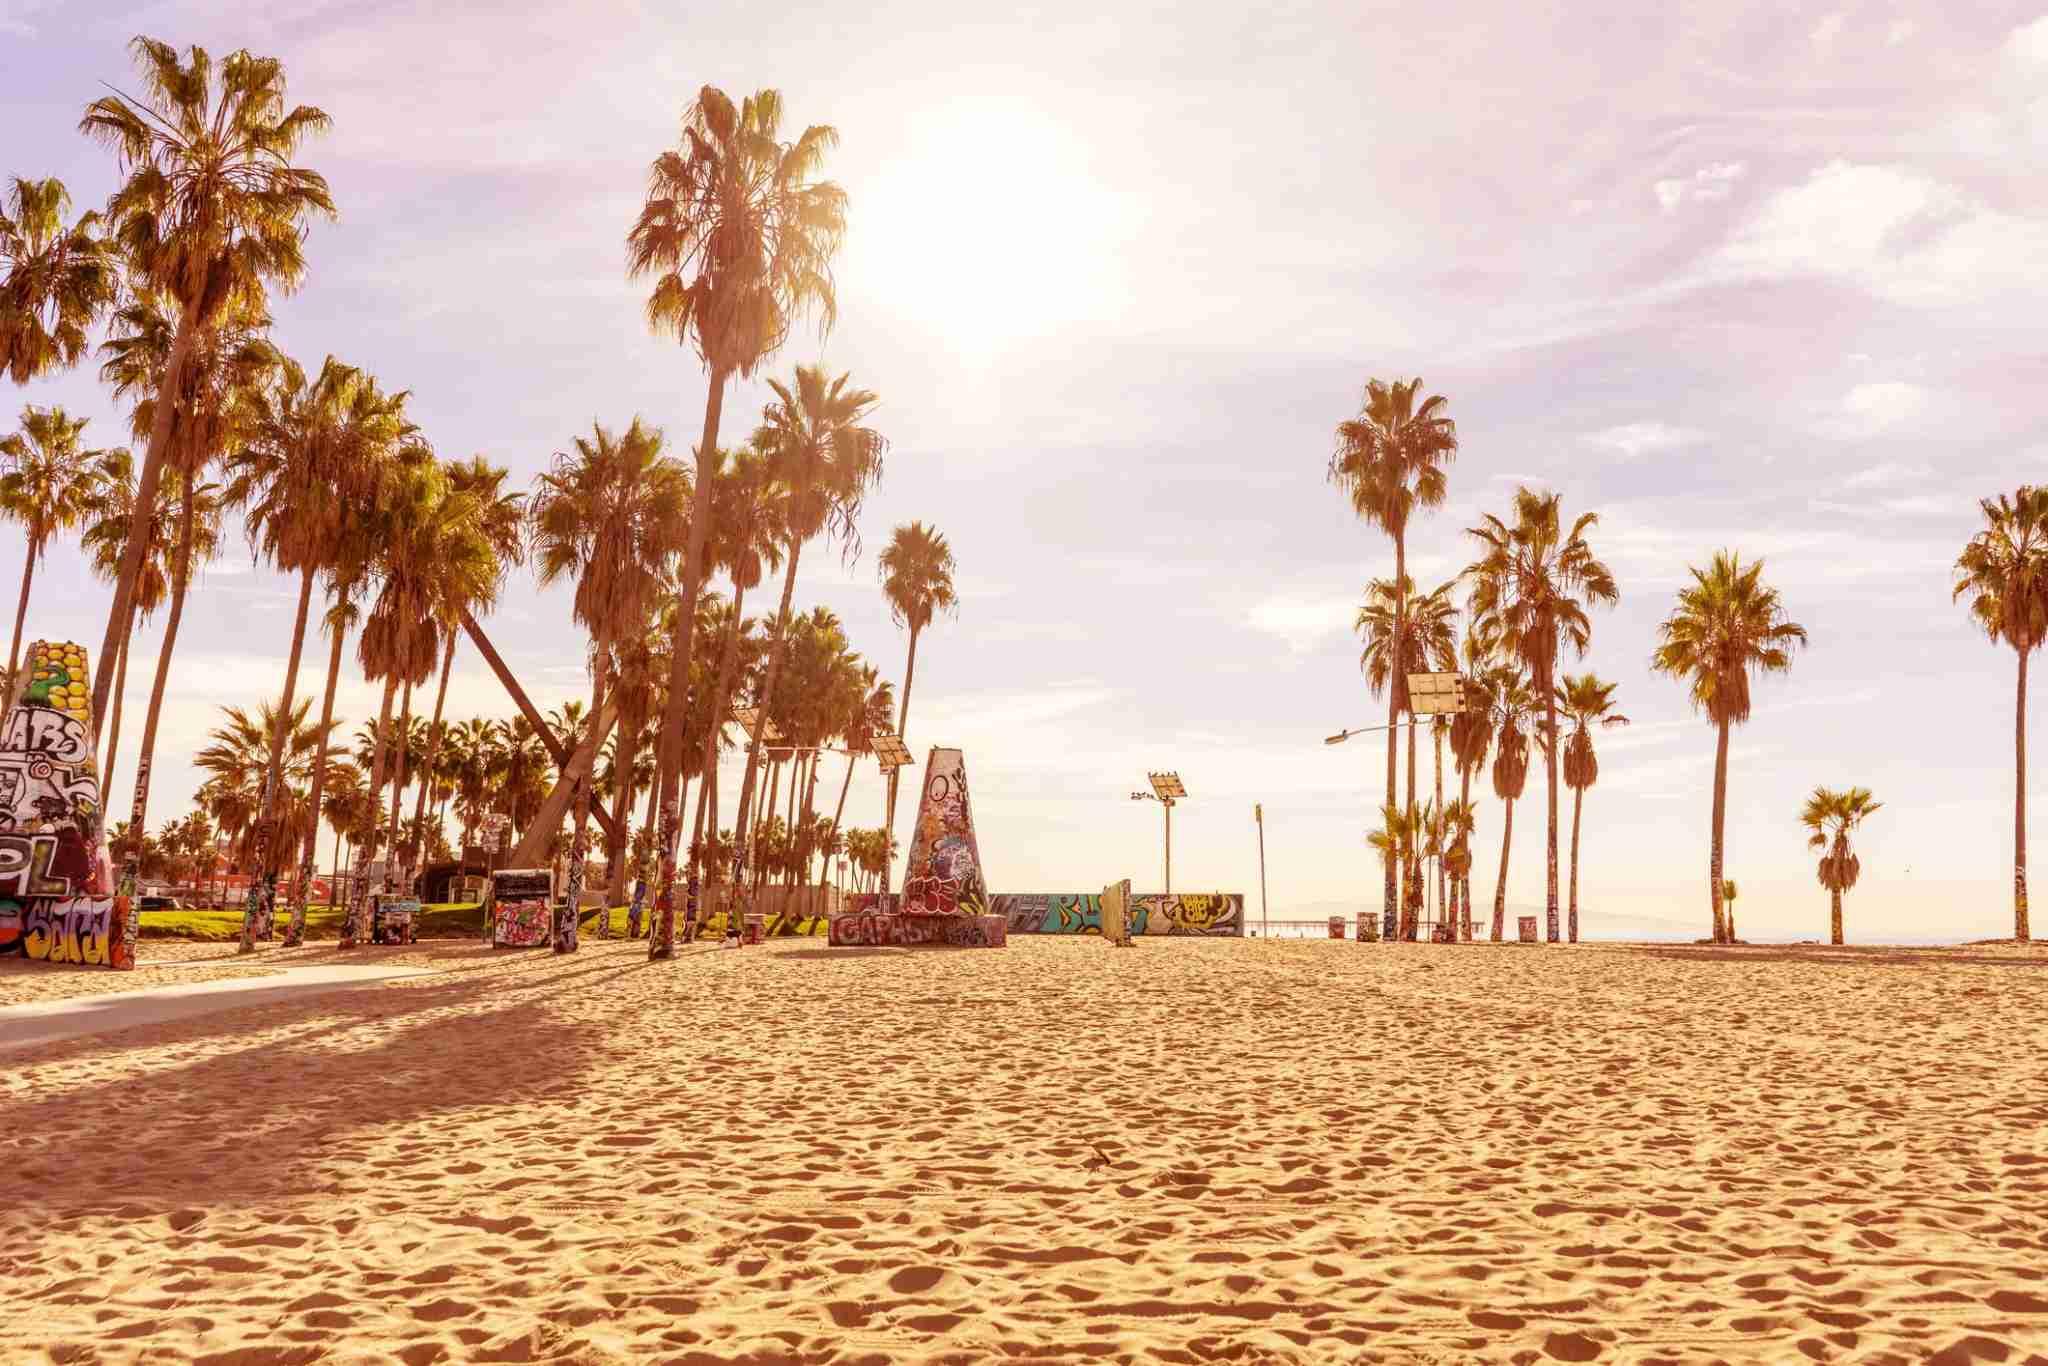 Venice beach in the morning. (Photo courtesy of Yuliia Hrozian)